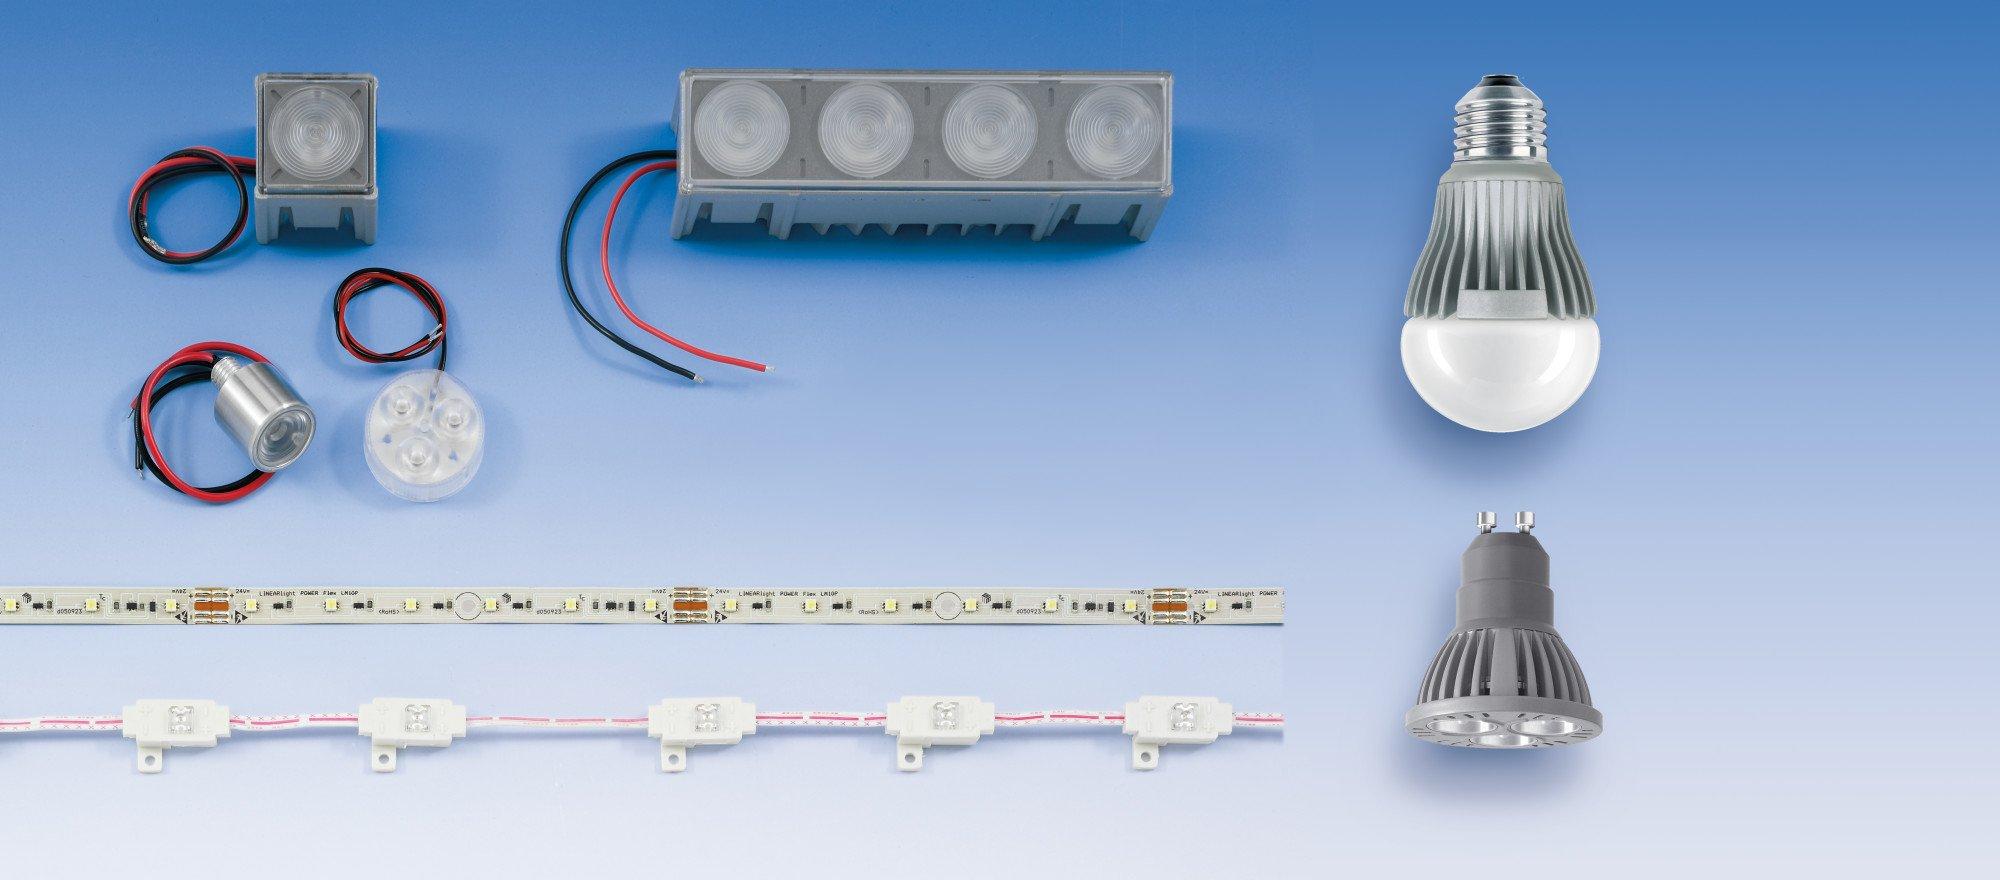 LED-Lampen   Elektro   Beleuchtung   Baunetz_Wissen